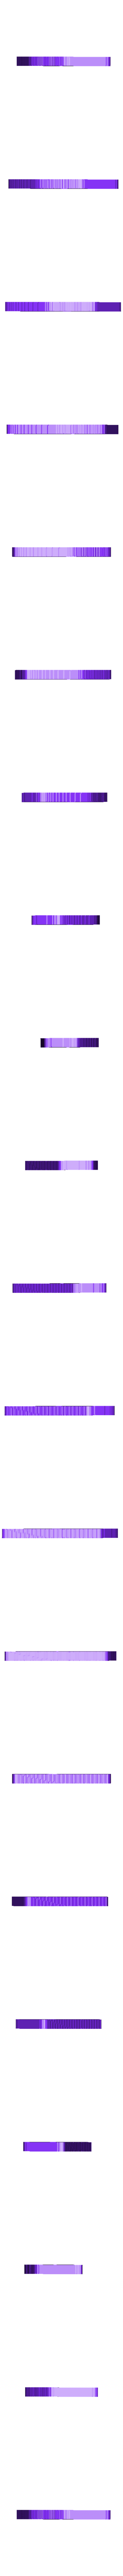 DF XDerby Formula Monaco Front Wing.stl Download free STL file Dreamfactory XDerby • 3D printer template, yanizo